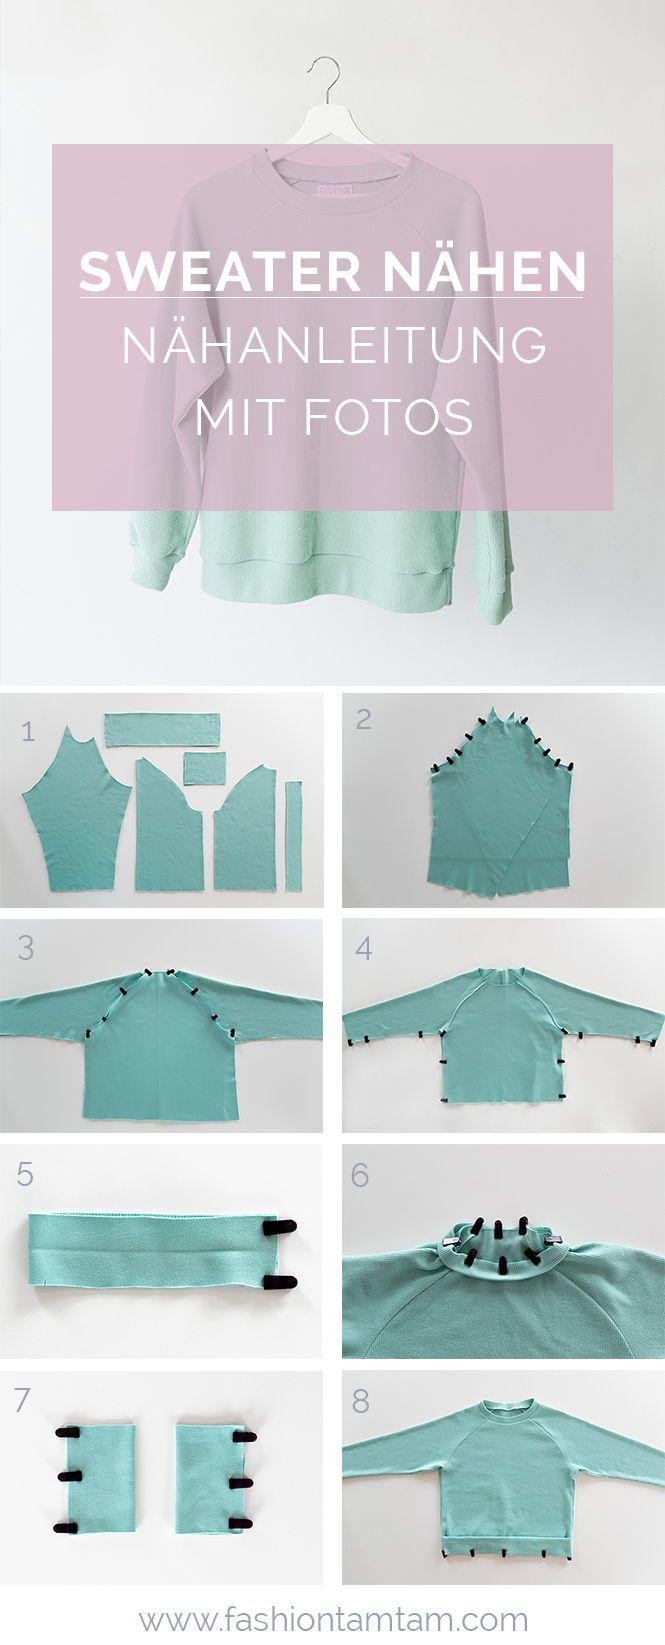 Nähanleitung: Sweater mit Raglanärmeln nähen – fashiontamtam.com